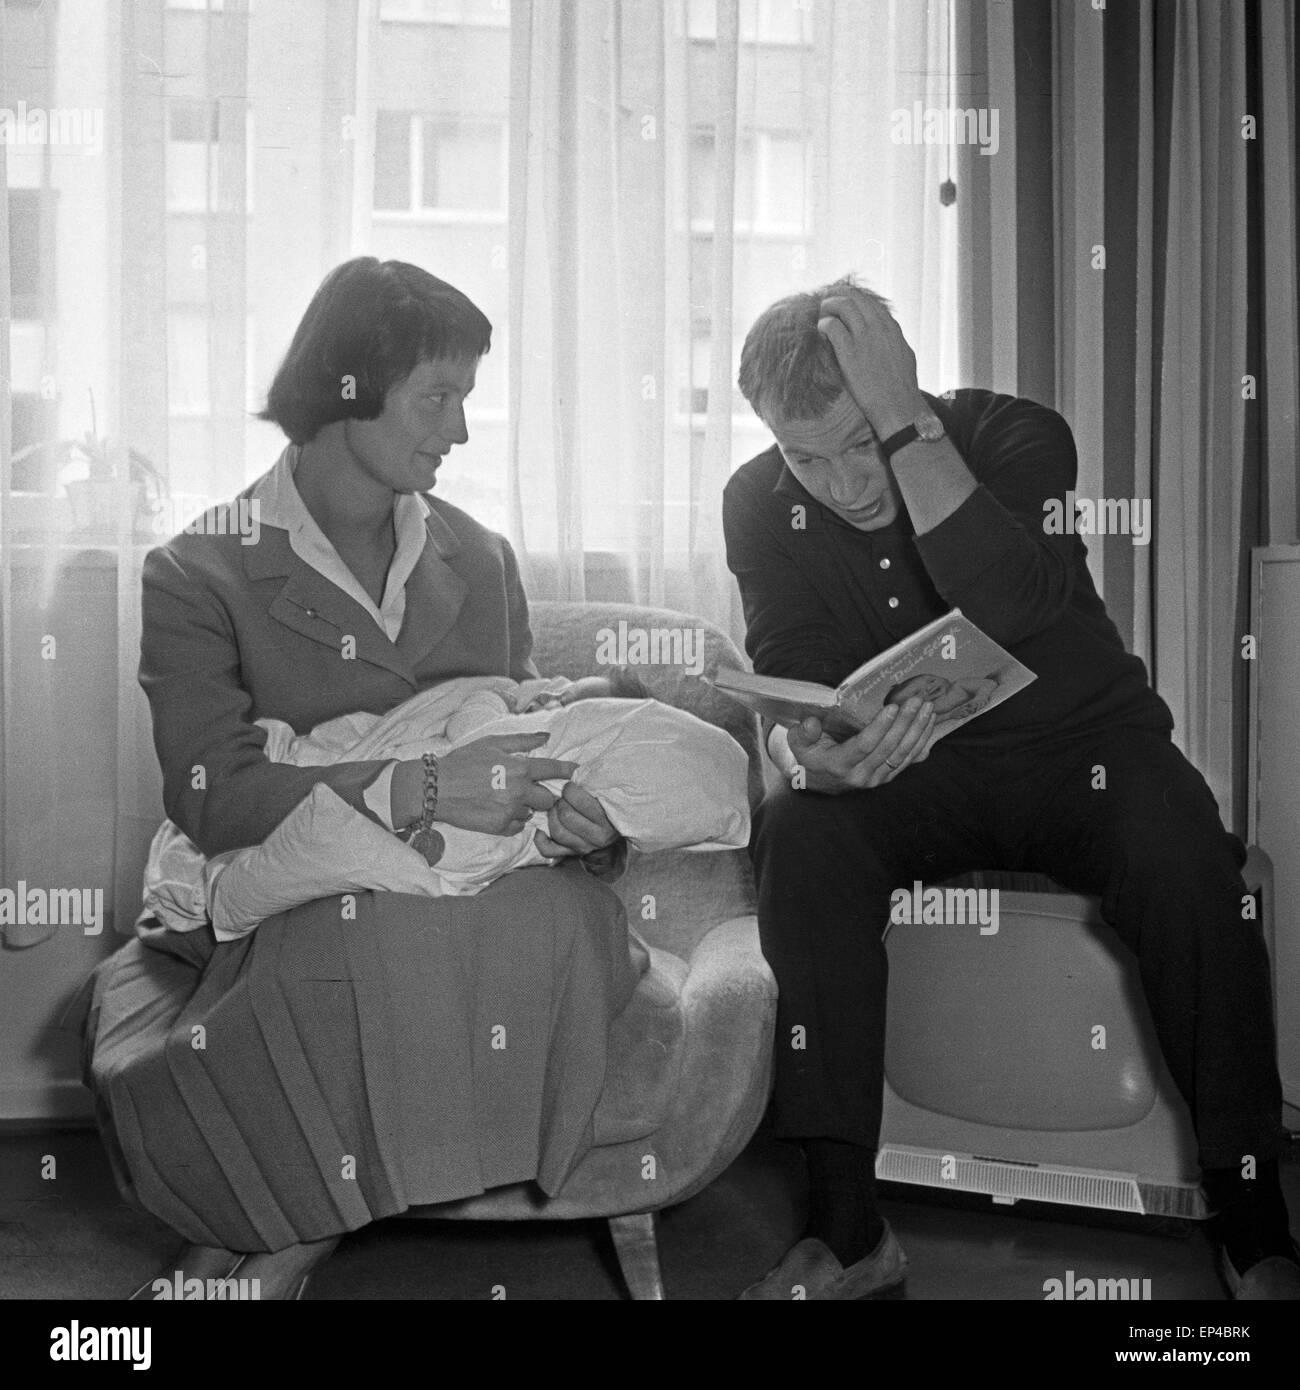 family tv 1950s stockfotos family tv 1950s bilder alamy. Black Bedroom Furniture Sets. Home Design Ideas